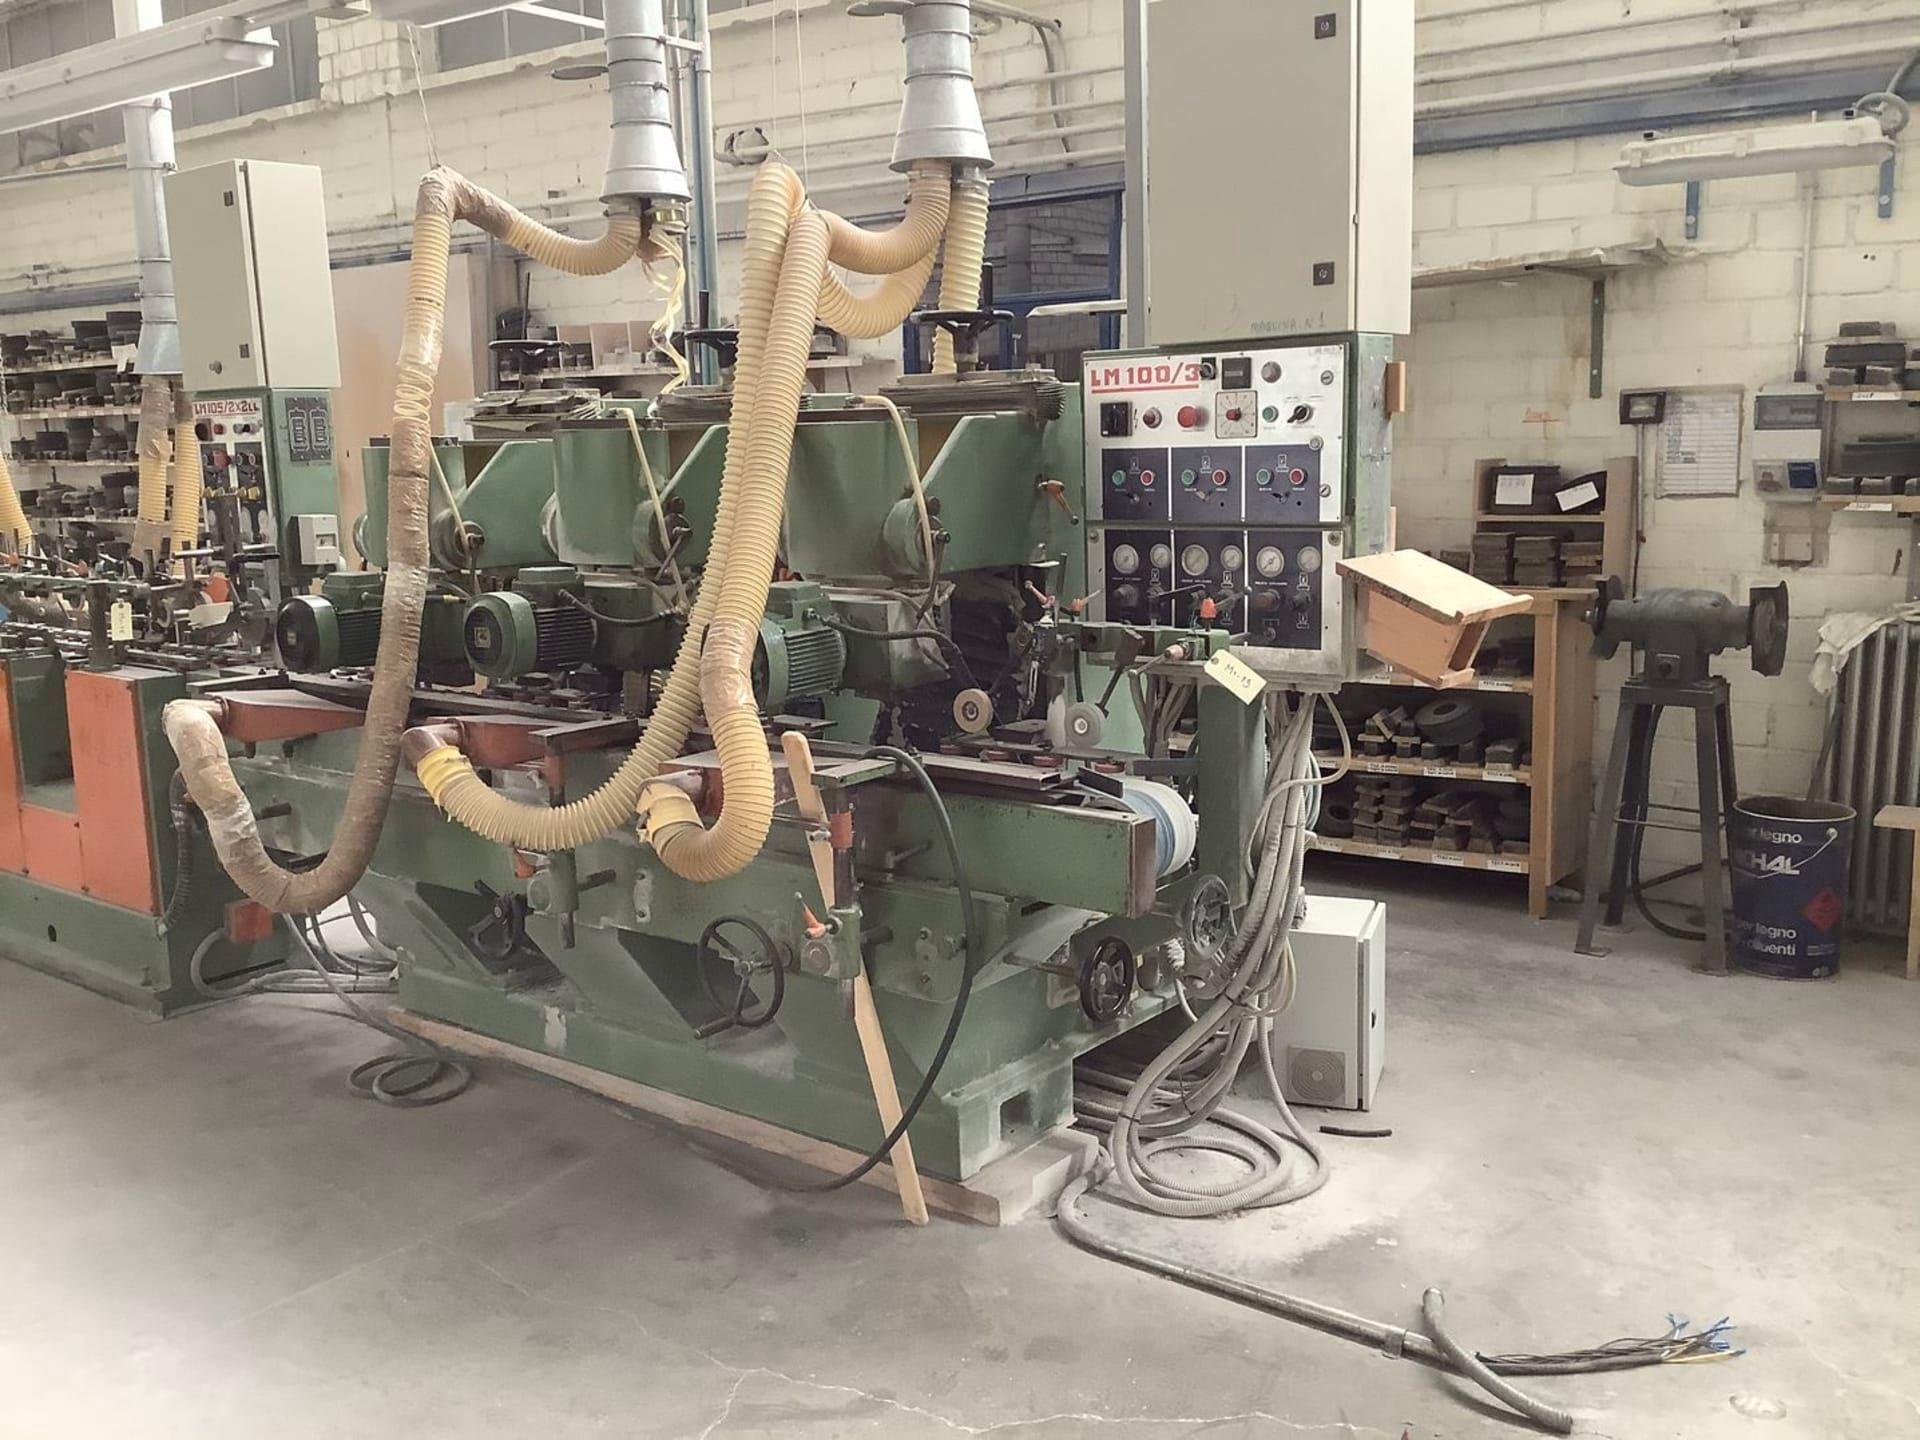 BALENCIAGA LM 100 3 Profil-Schleifmaschine